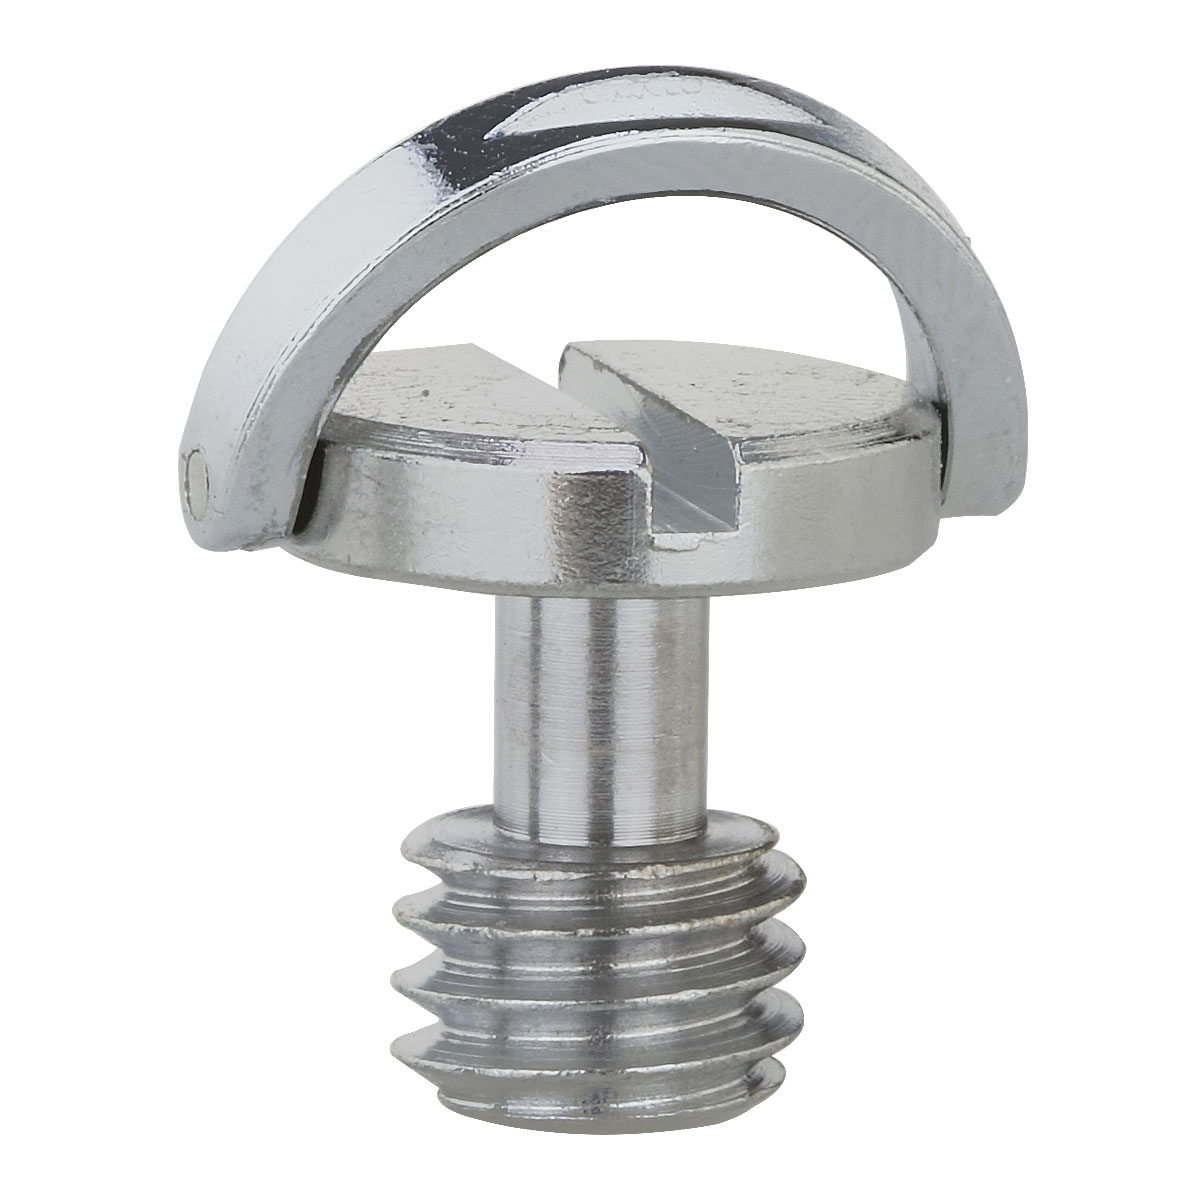 10pcs new captive 3 8 d ring screw bolt for camera tripod quick release plate 6933996100017 ebay. Black Bedroom Furniture Sets. Home Design Ideas